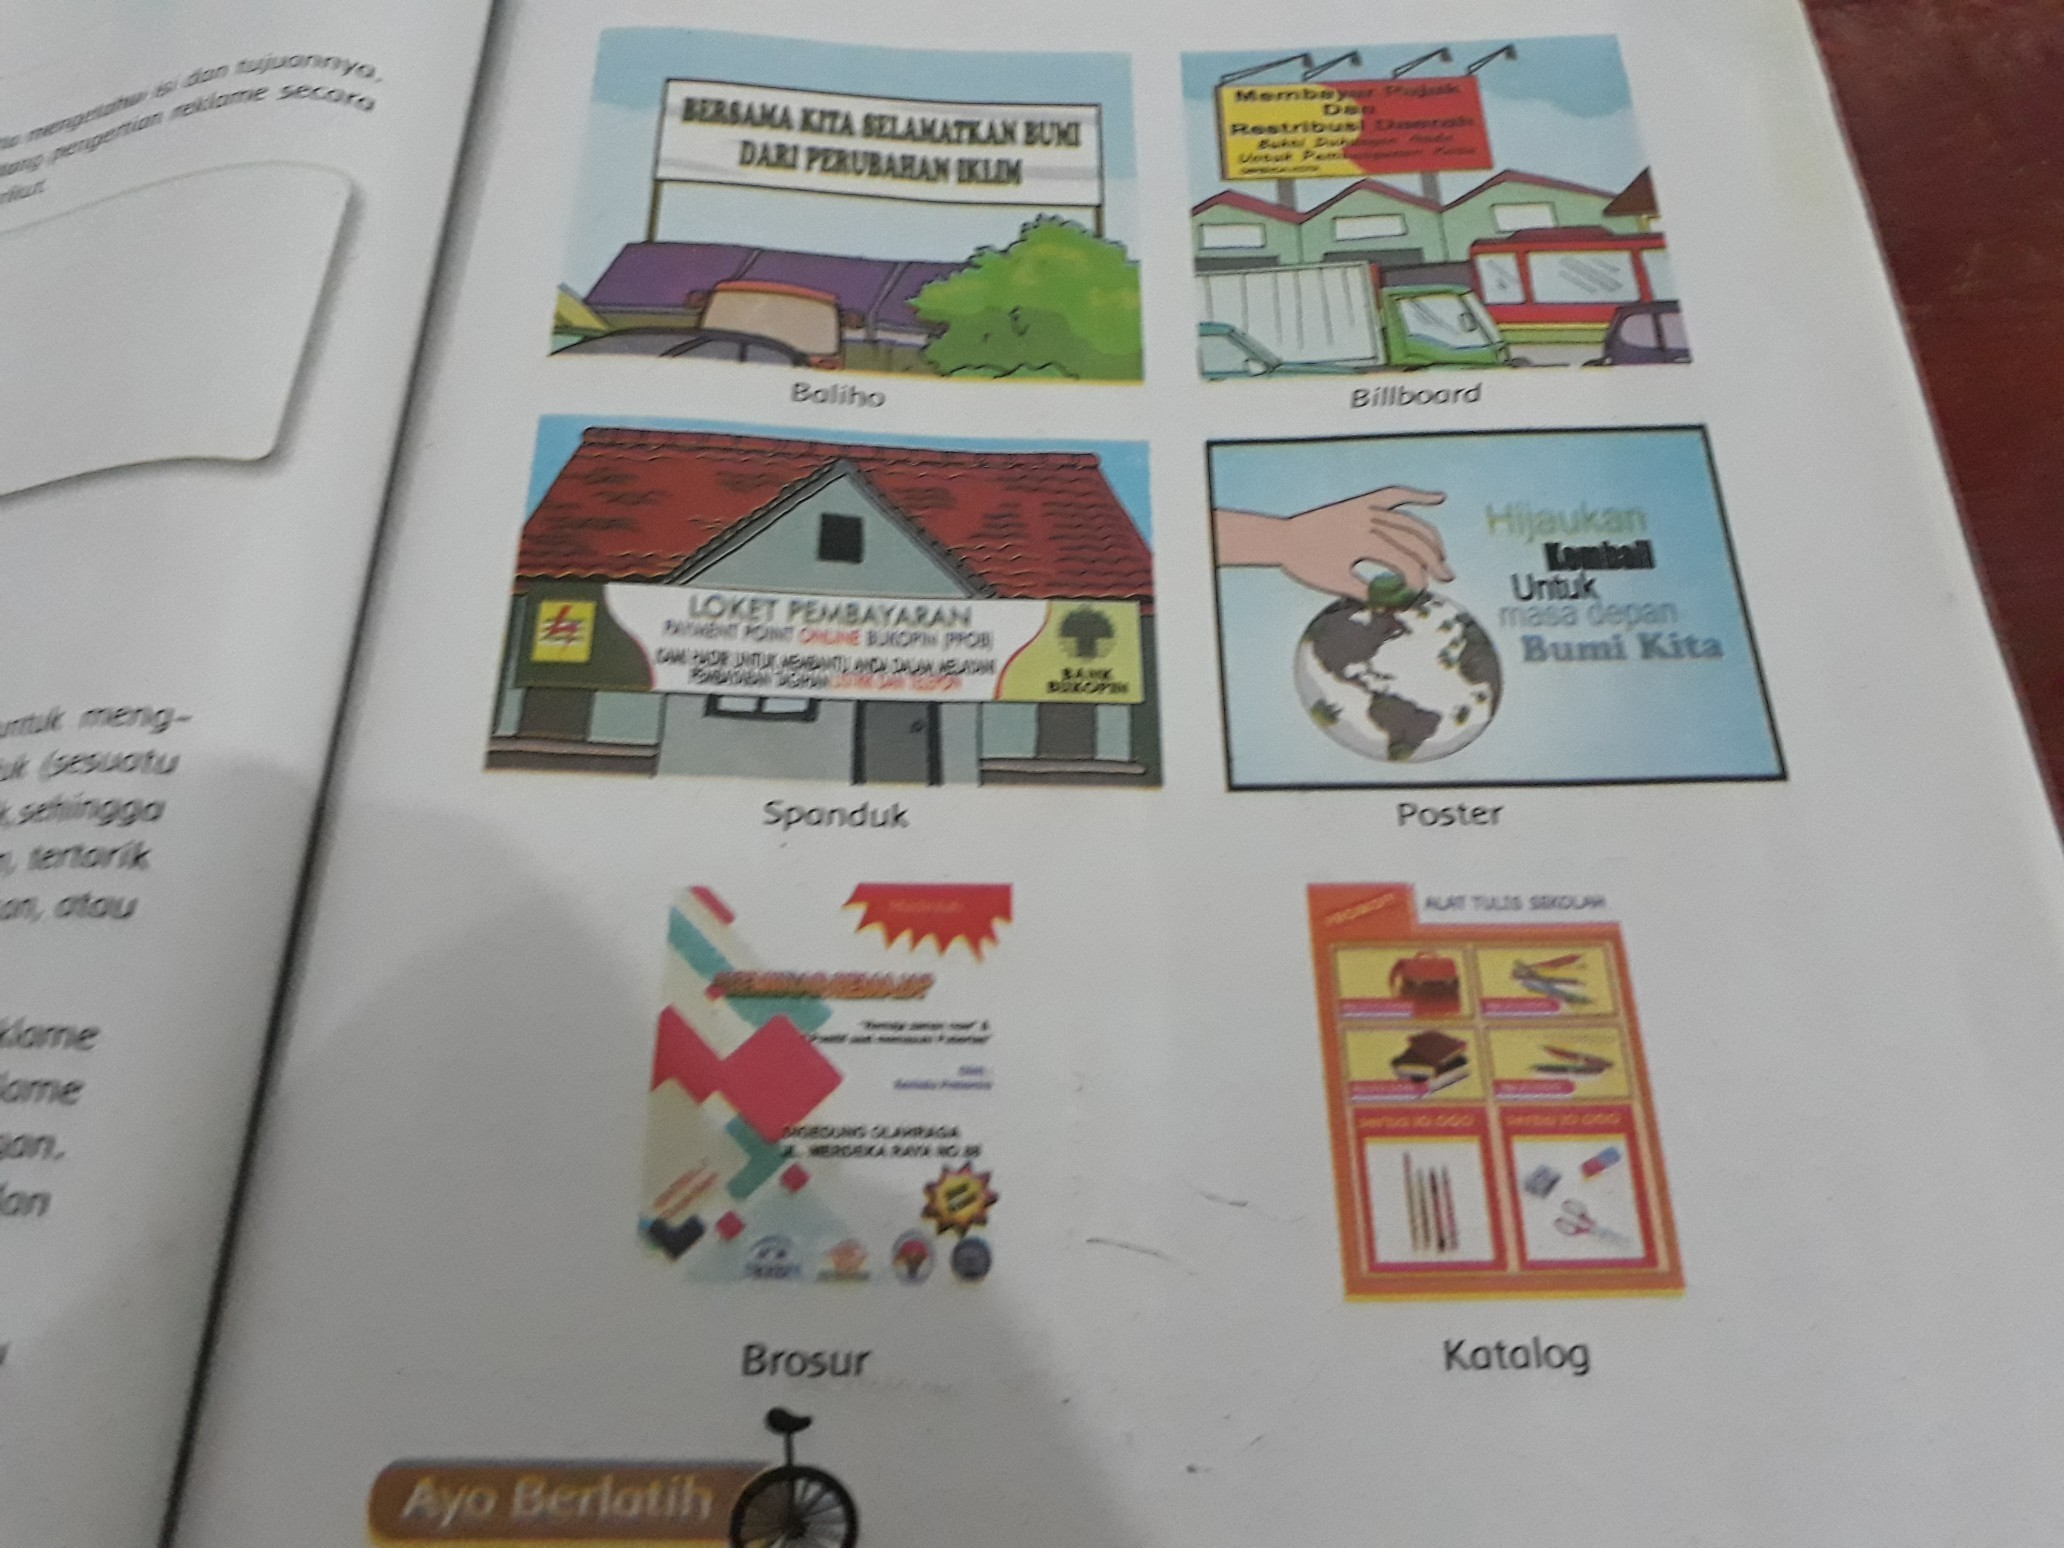 Reklame Papan Nama Pamflet Dan Led Merupakan Contoh ...